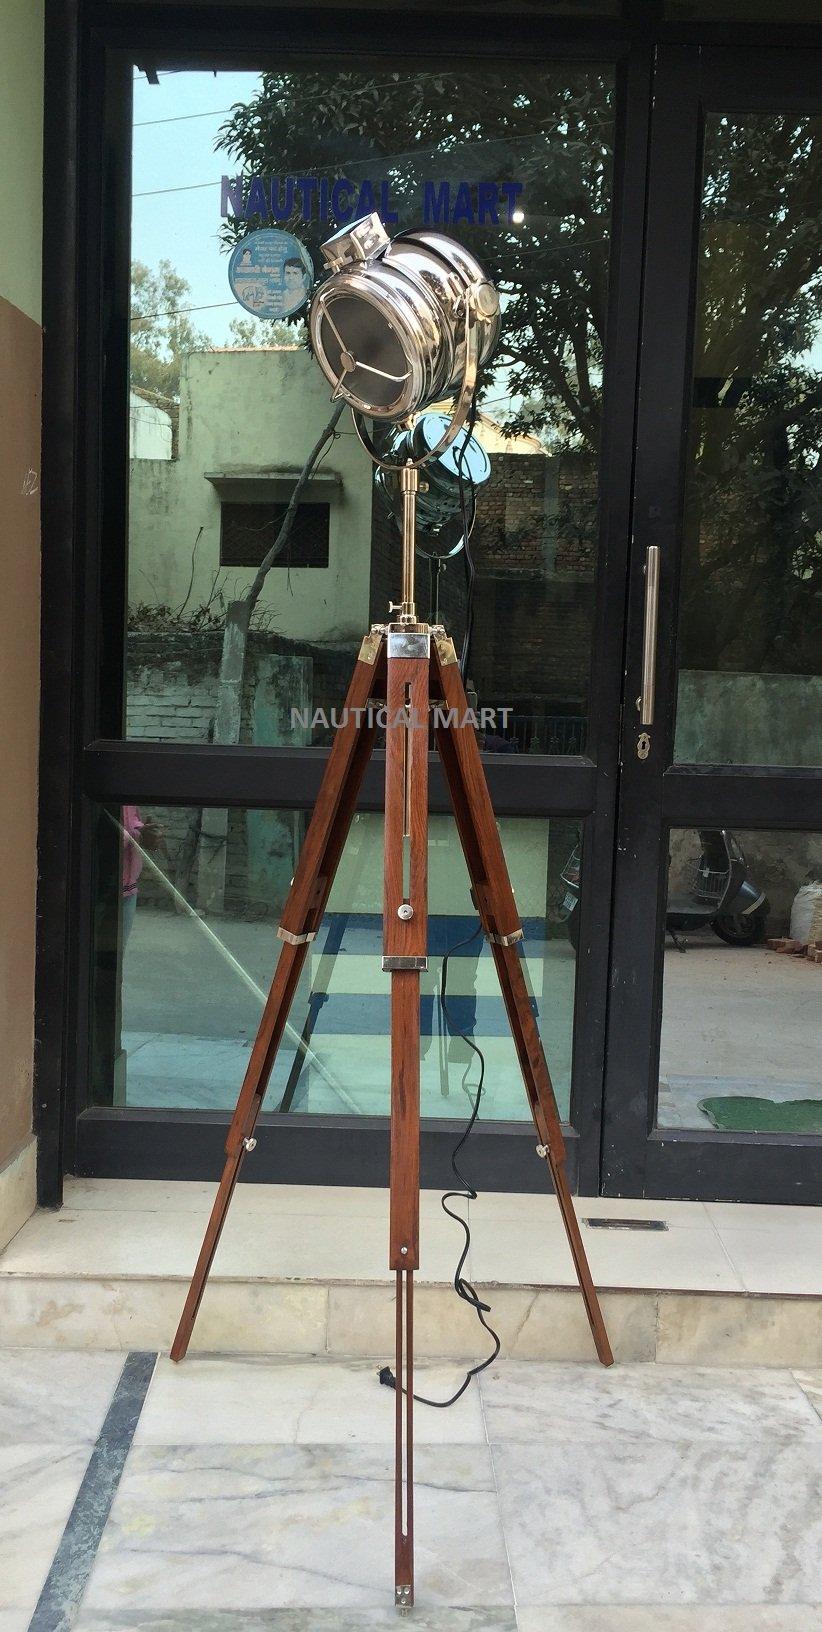 NAUTICALMART VINTAGE BRITISH MOVIE STUDIO FLOOR LAMP HOME DECOR LIGHT